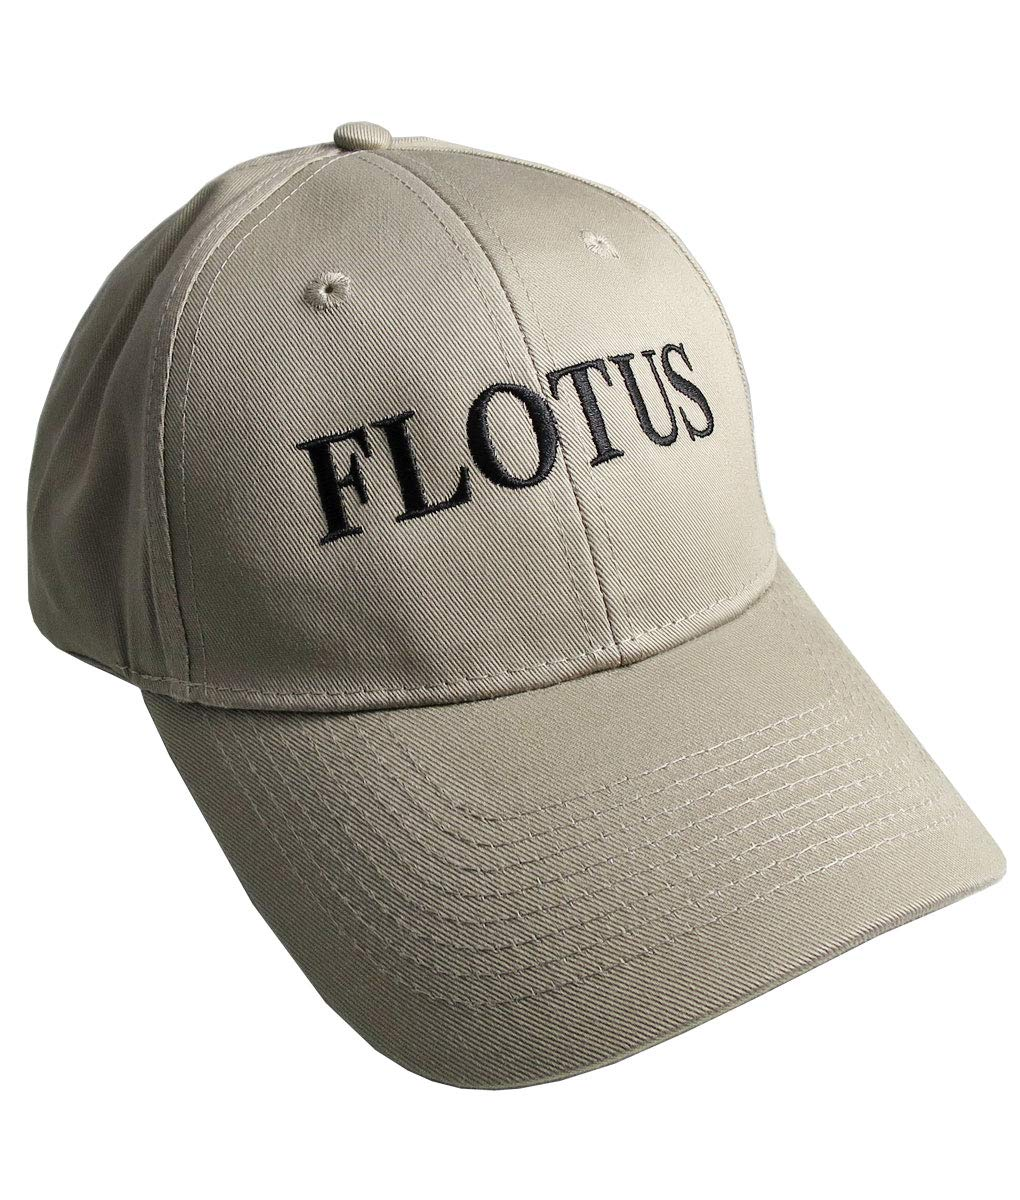 FREE SHIP. FLOTUS Melania Trump EMBROIDERED Baseball Hat Cap